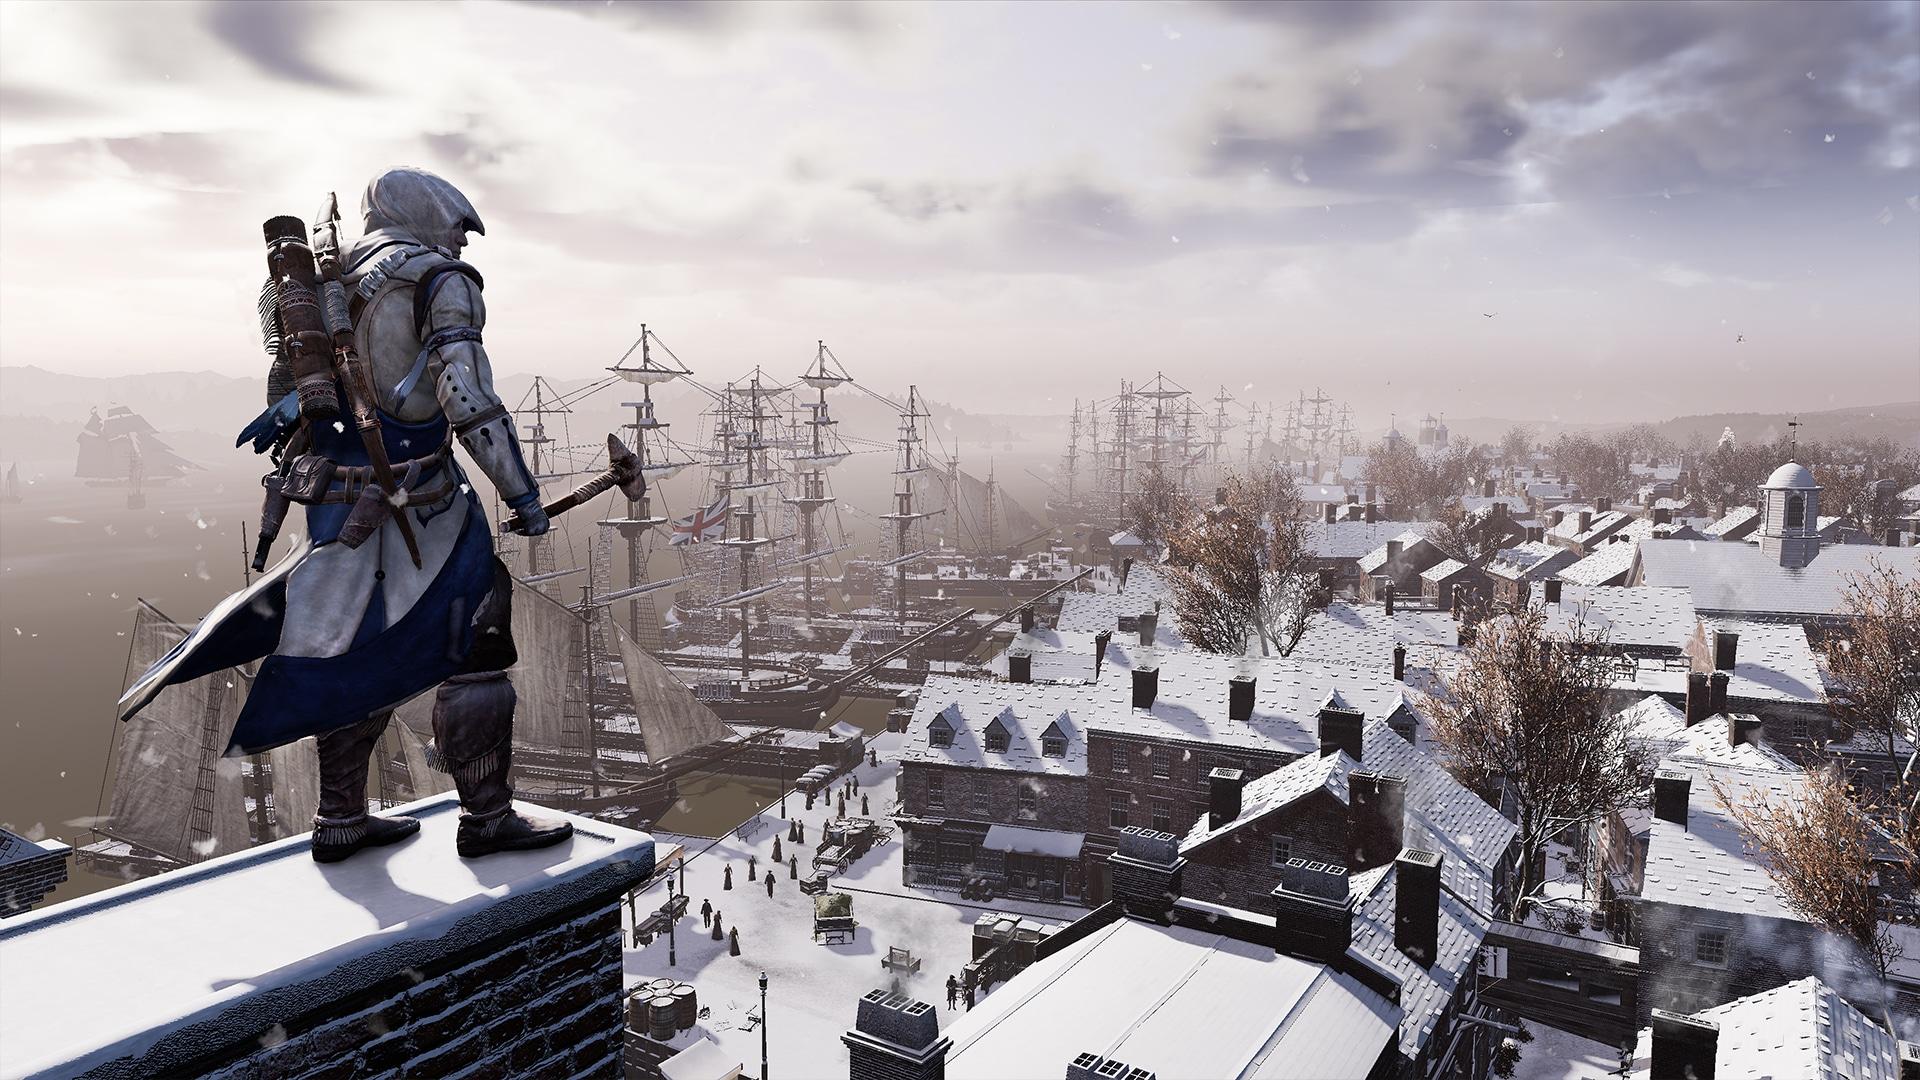 Assassin's Creed III: Remastered (Nintendo Switch) - Nintendo Key - UNITED STATES - 2